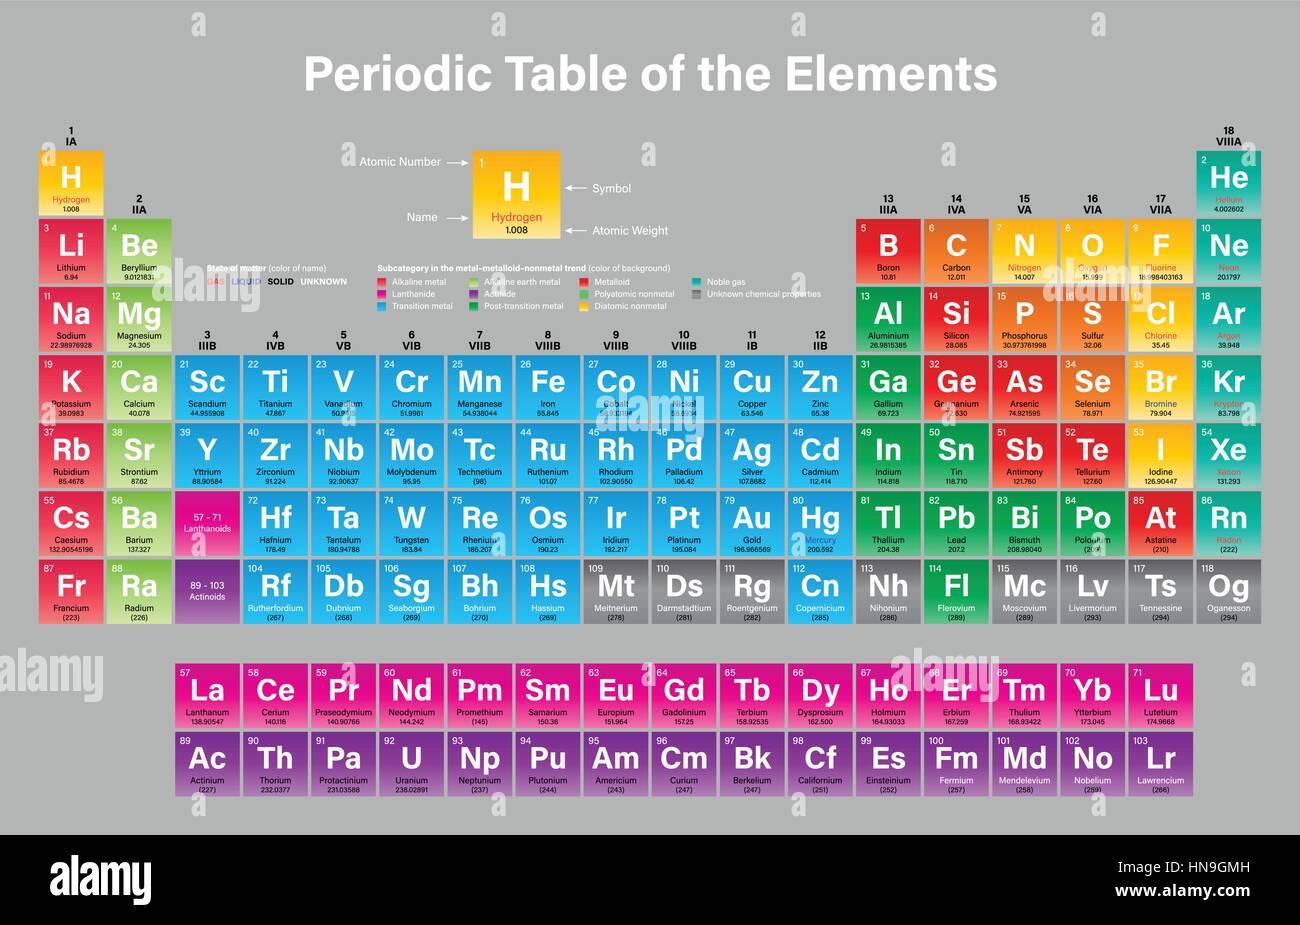 Science Symbols Stock Photos & Science Symbols Stock Images - Alamy